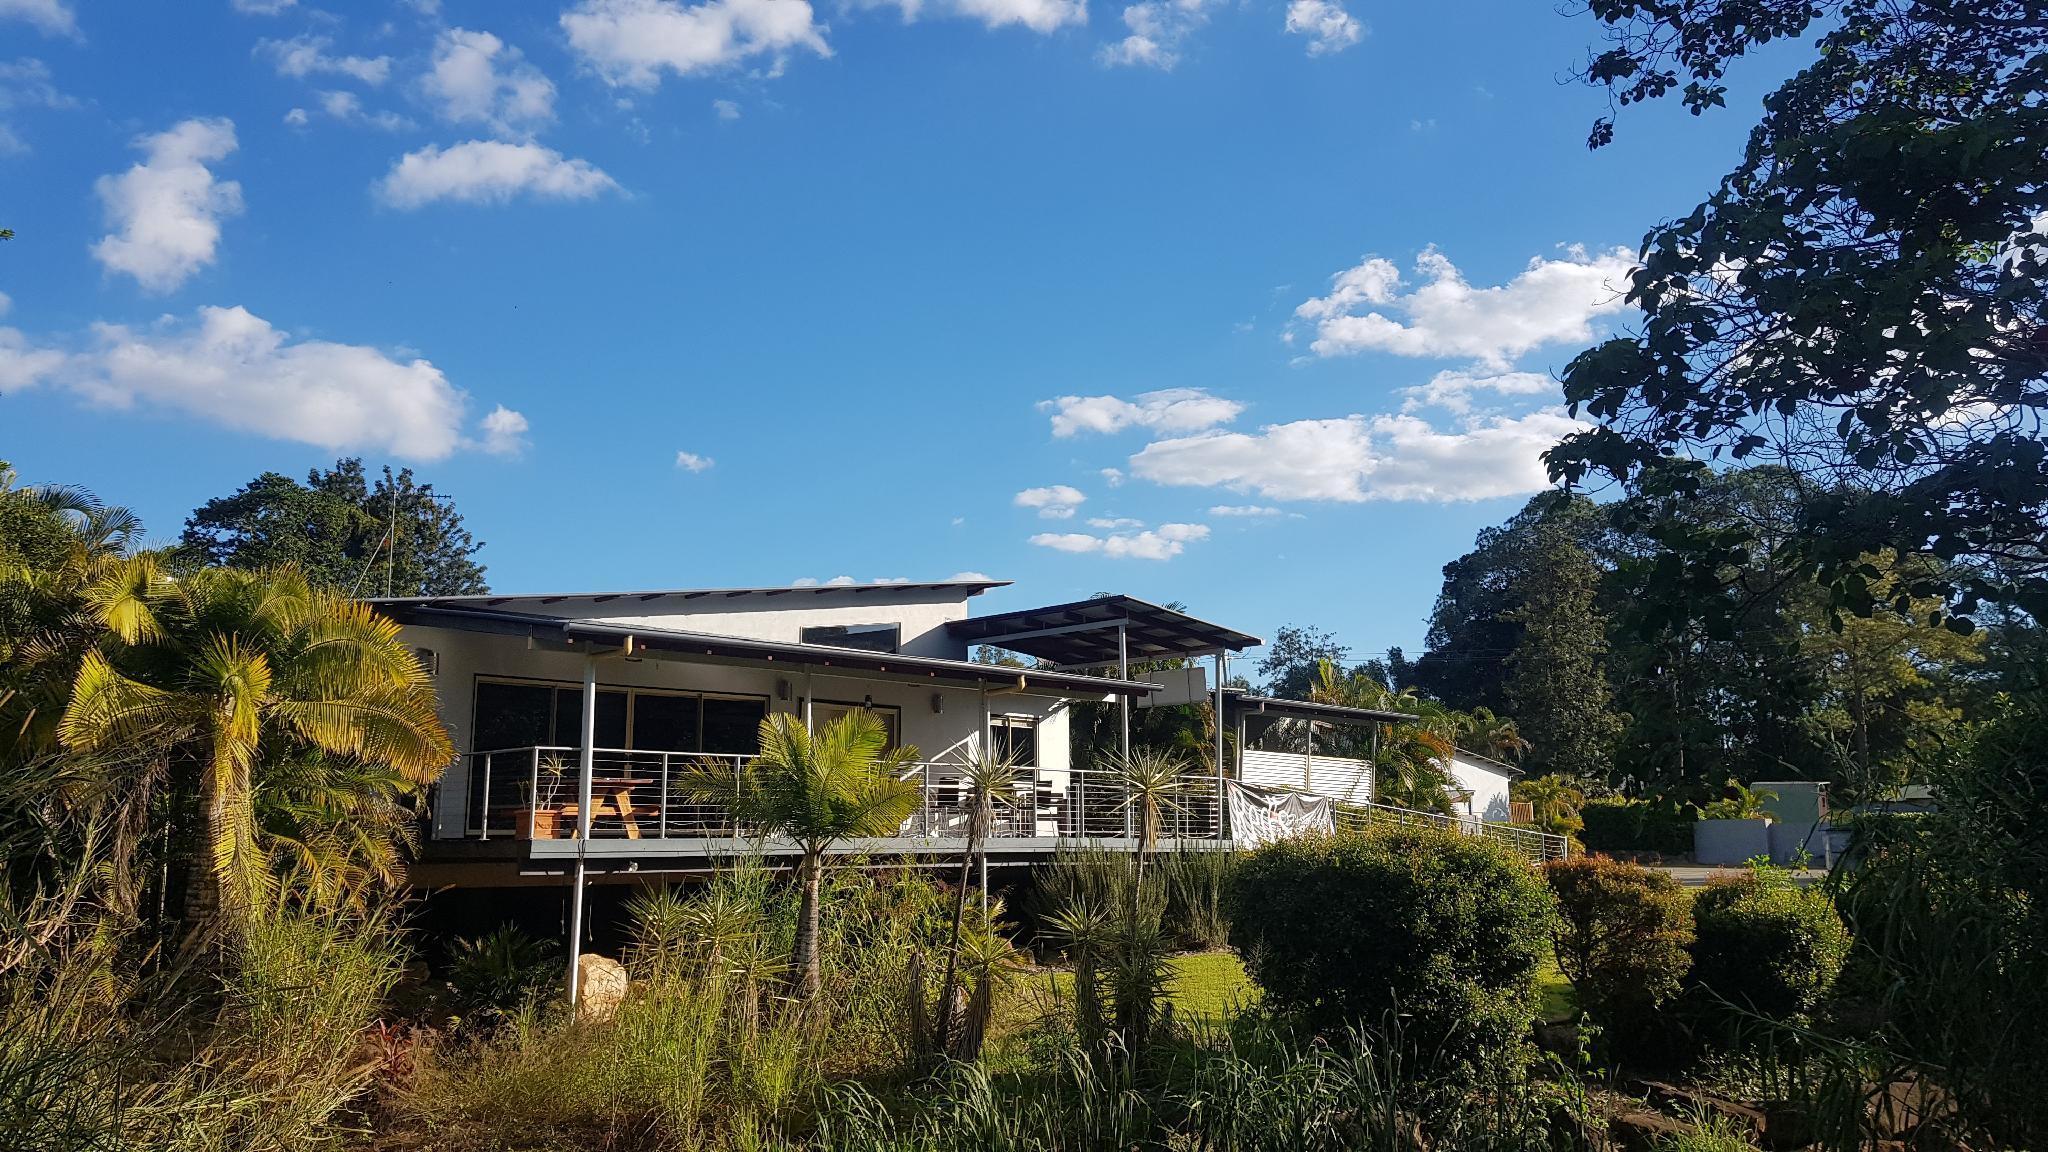 Red Bridge Motor Inn Reviews